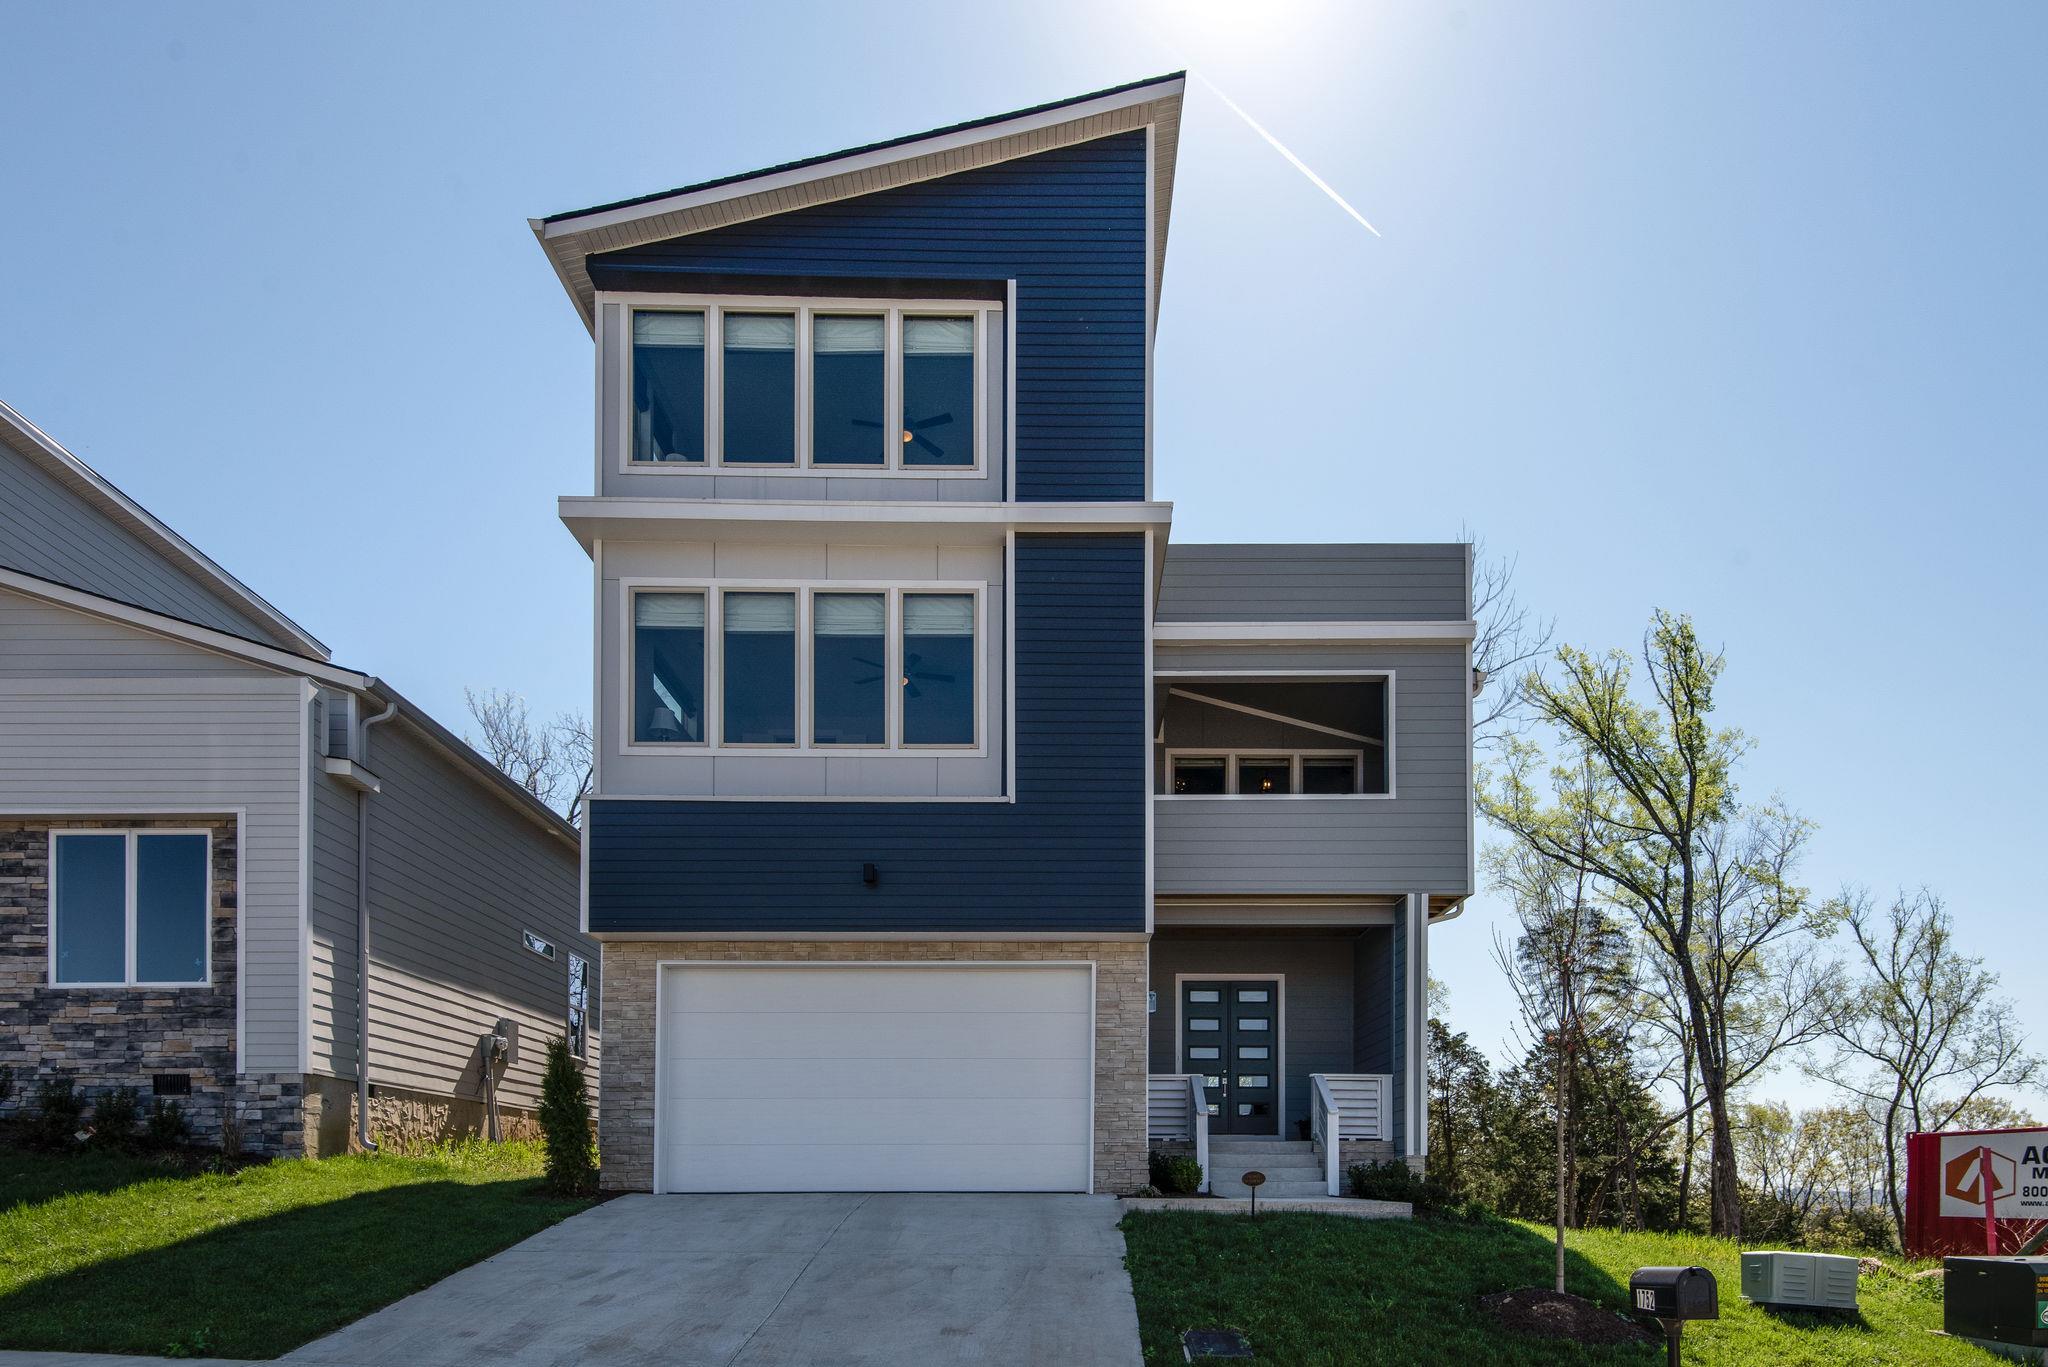 1752 Boxwood Dr, Nashville, TN 37211 - Nashville, TN real estate listing